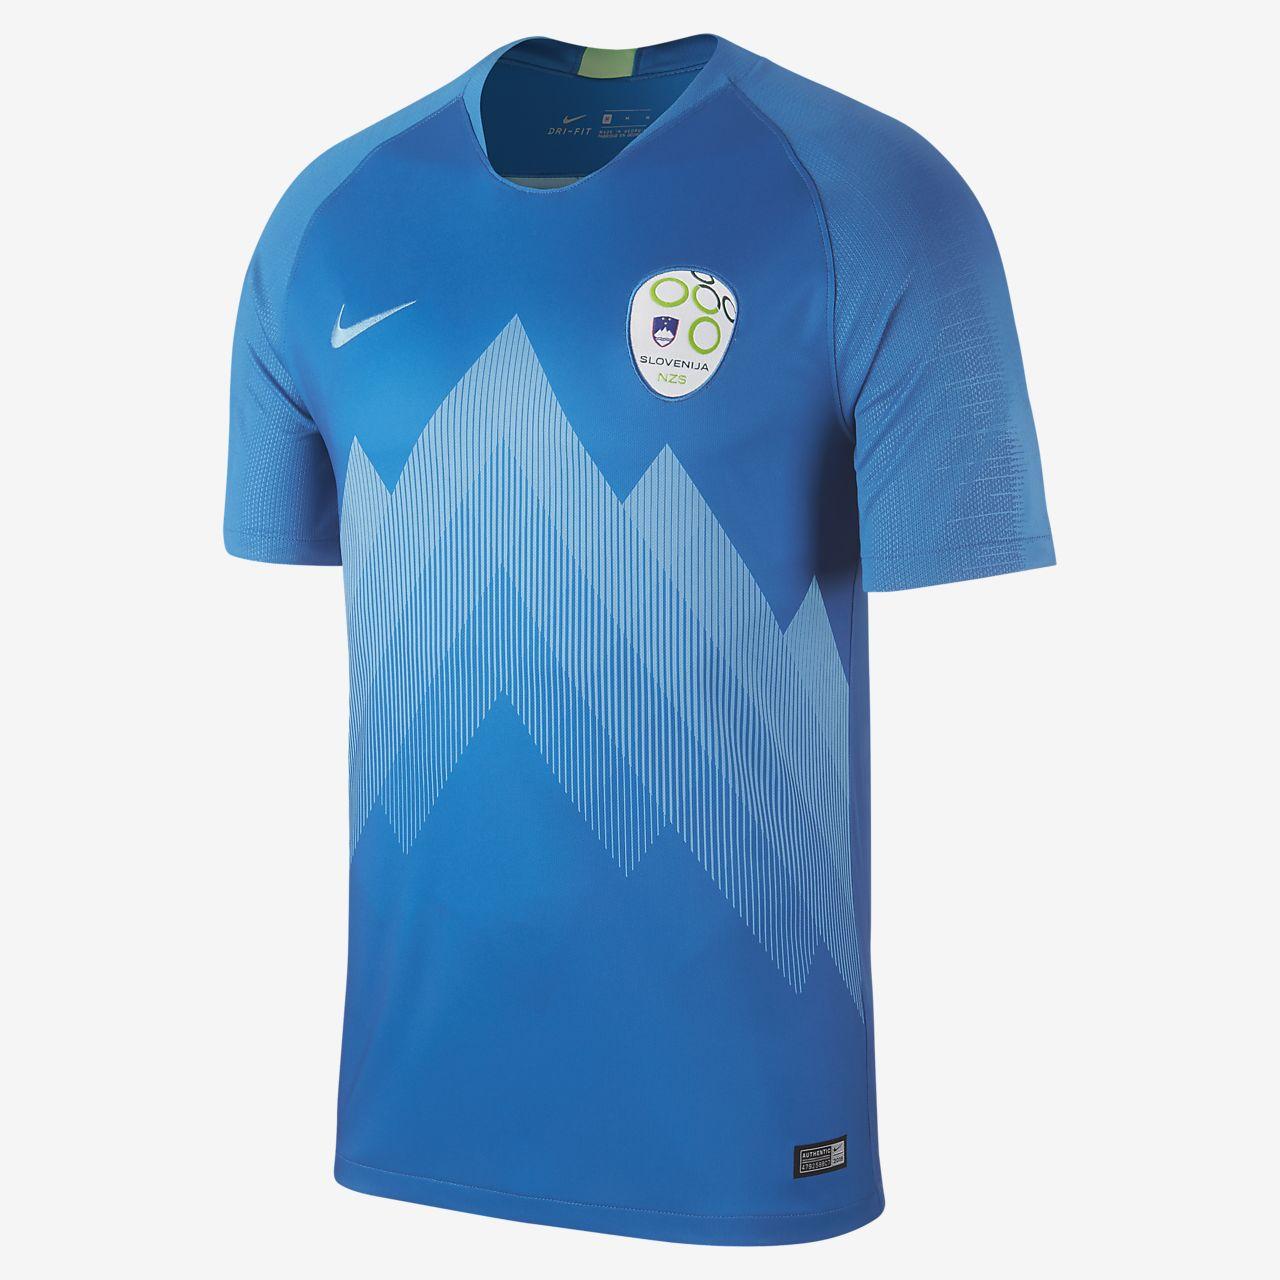 Maglia da calcio 2018 Slovenia Stadium Away - Uomo